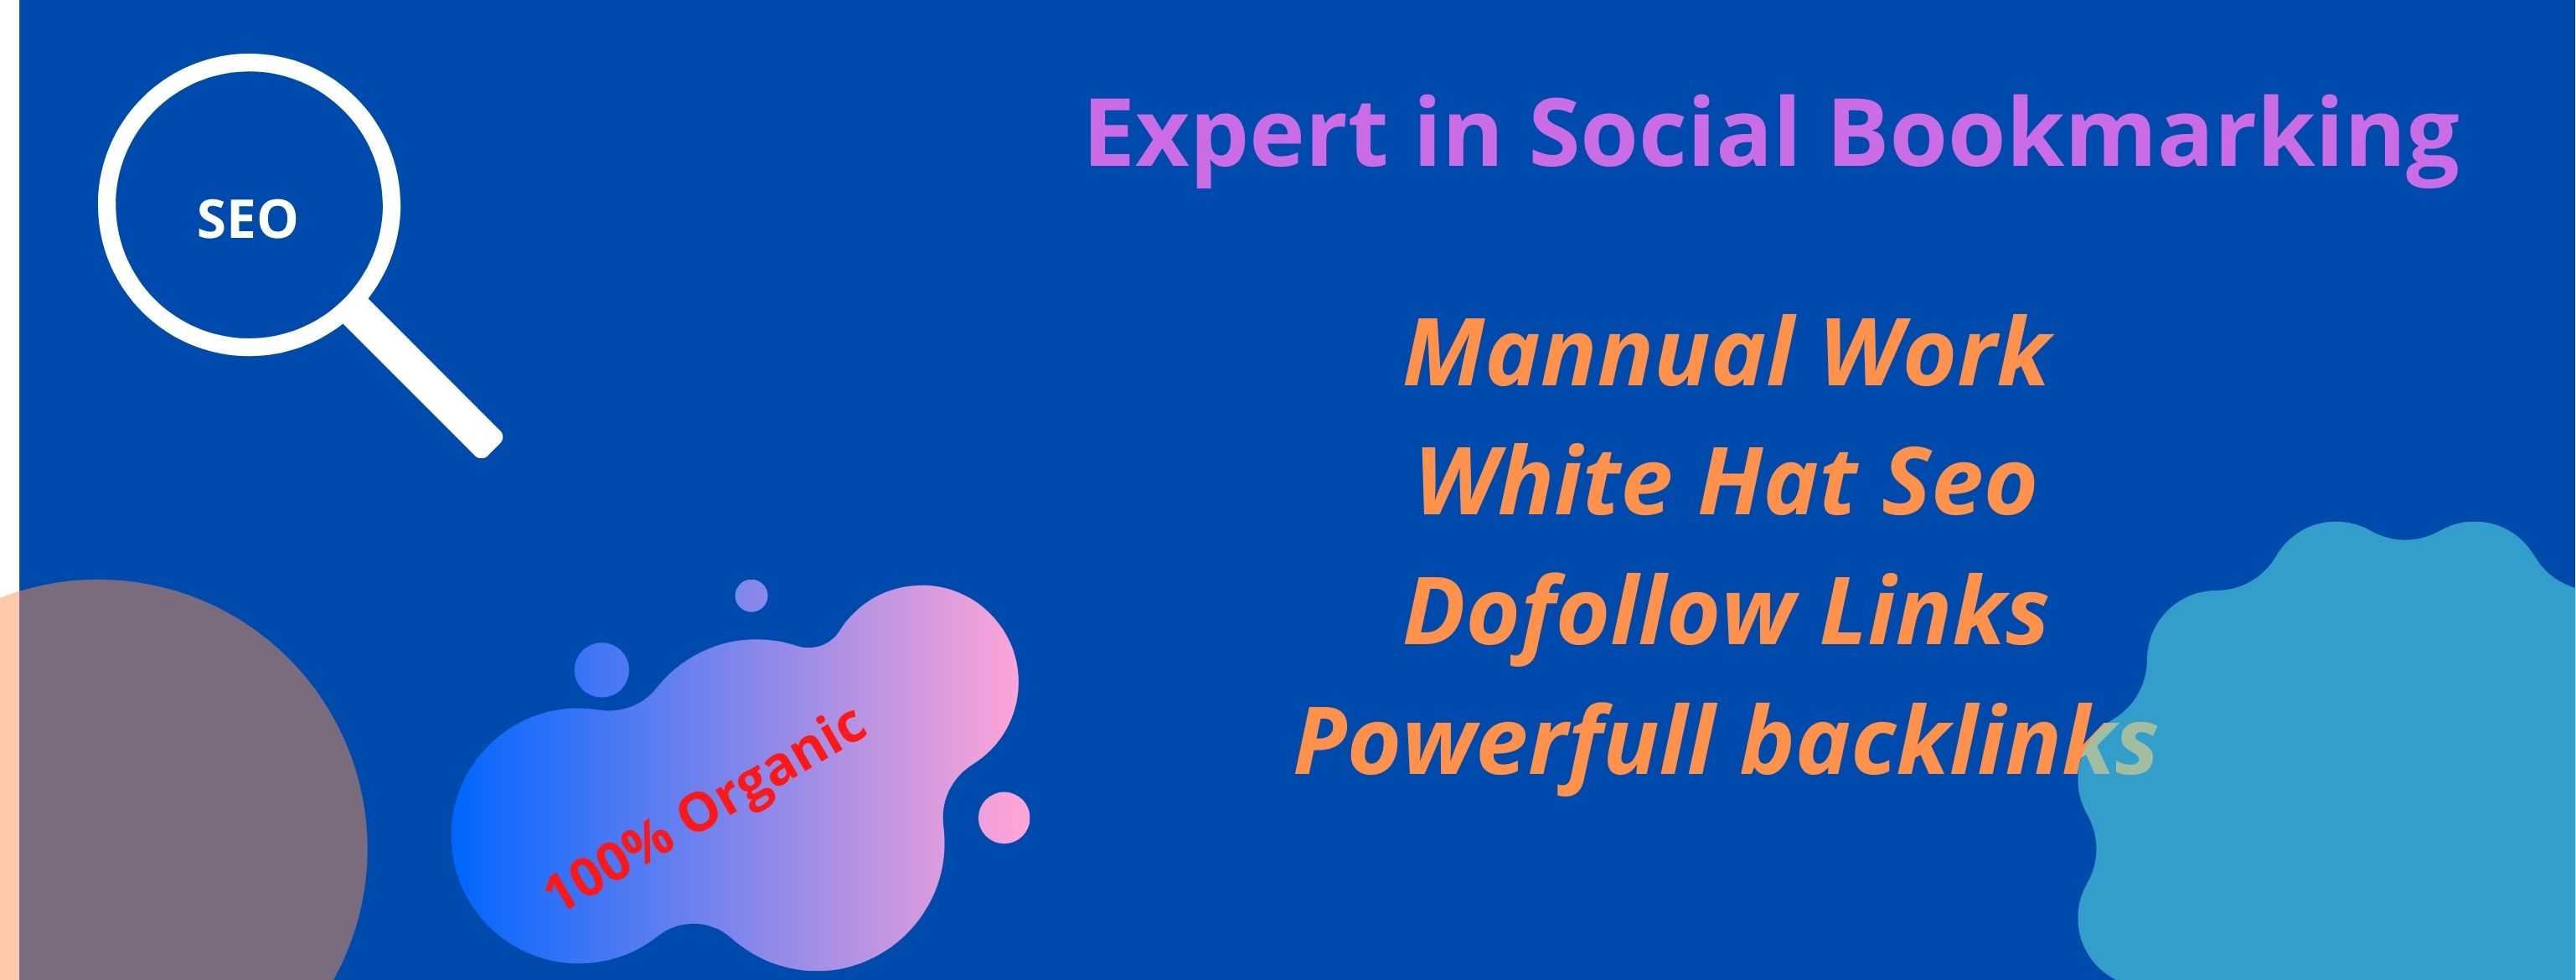 I will do create 150 social bookmarking